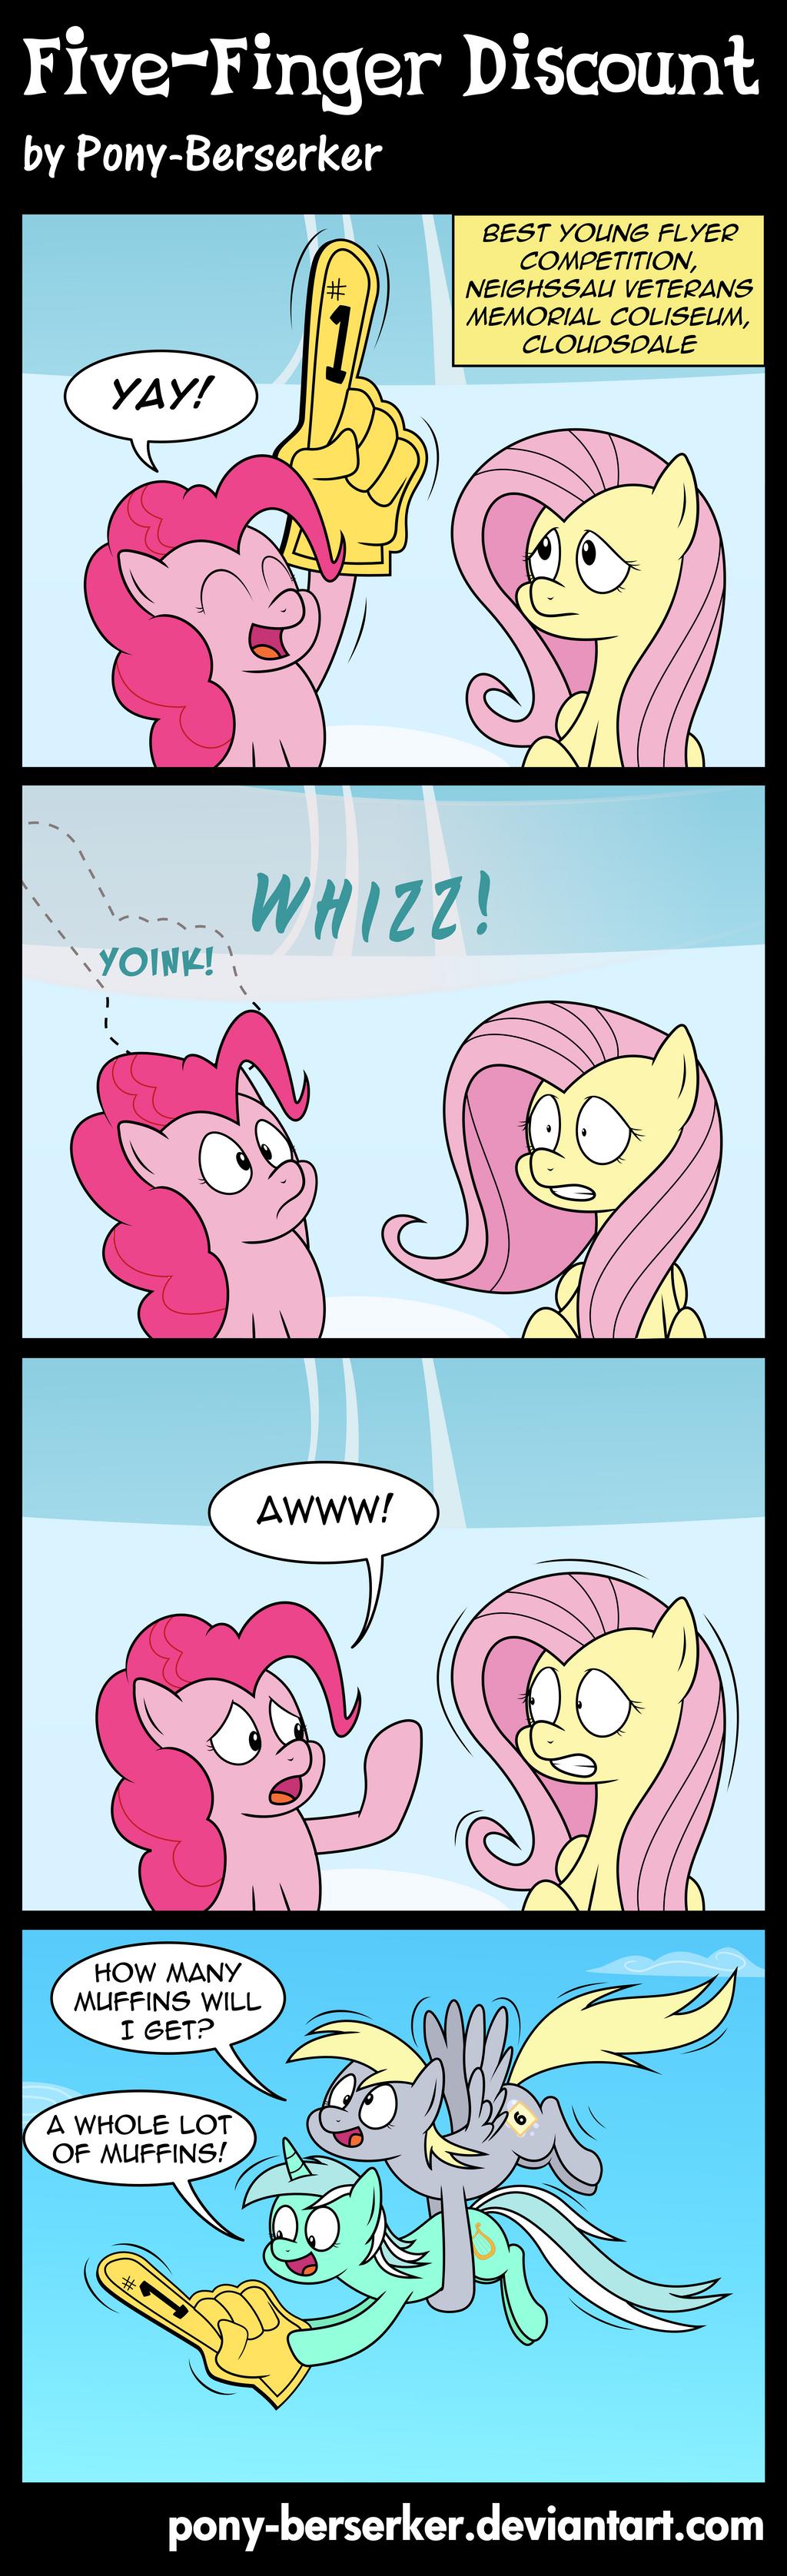 Five-Finger Discount by Pony-Berserker